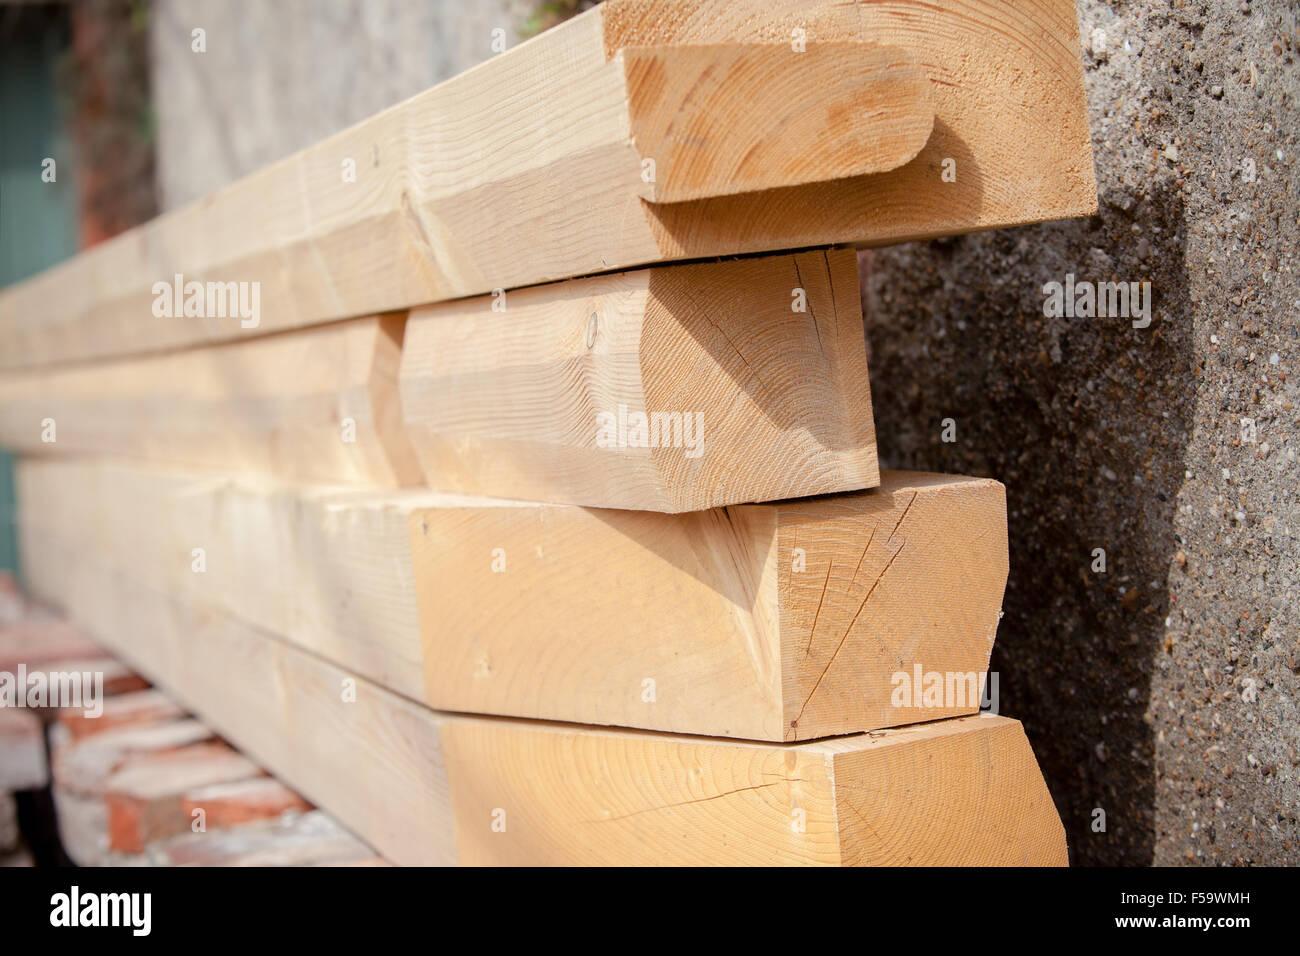 Construction New Wooden House Beams Stockfotos & Construction New ...